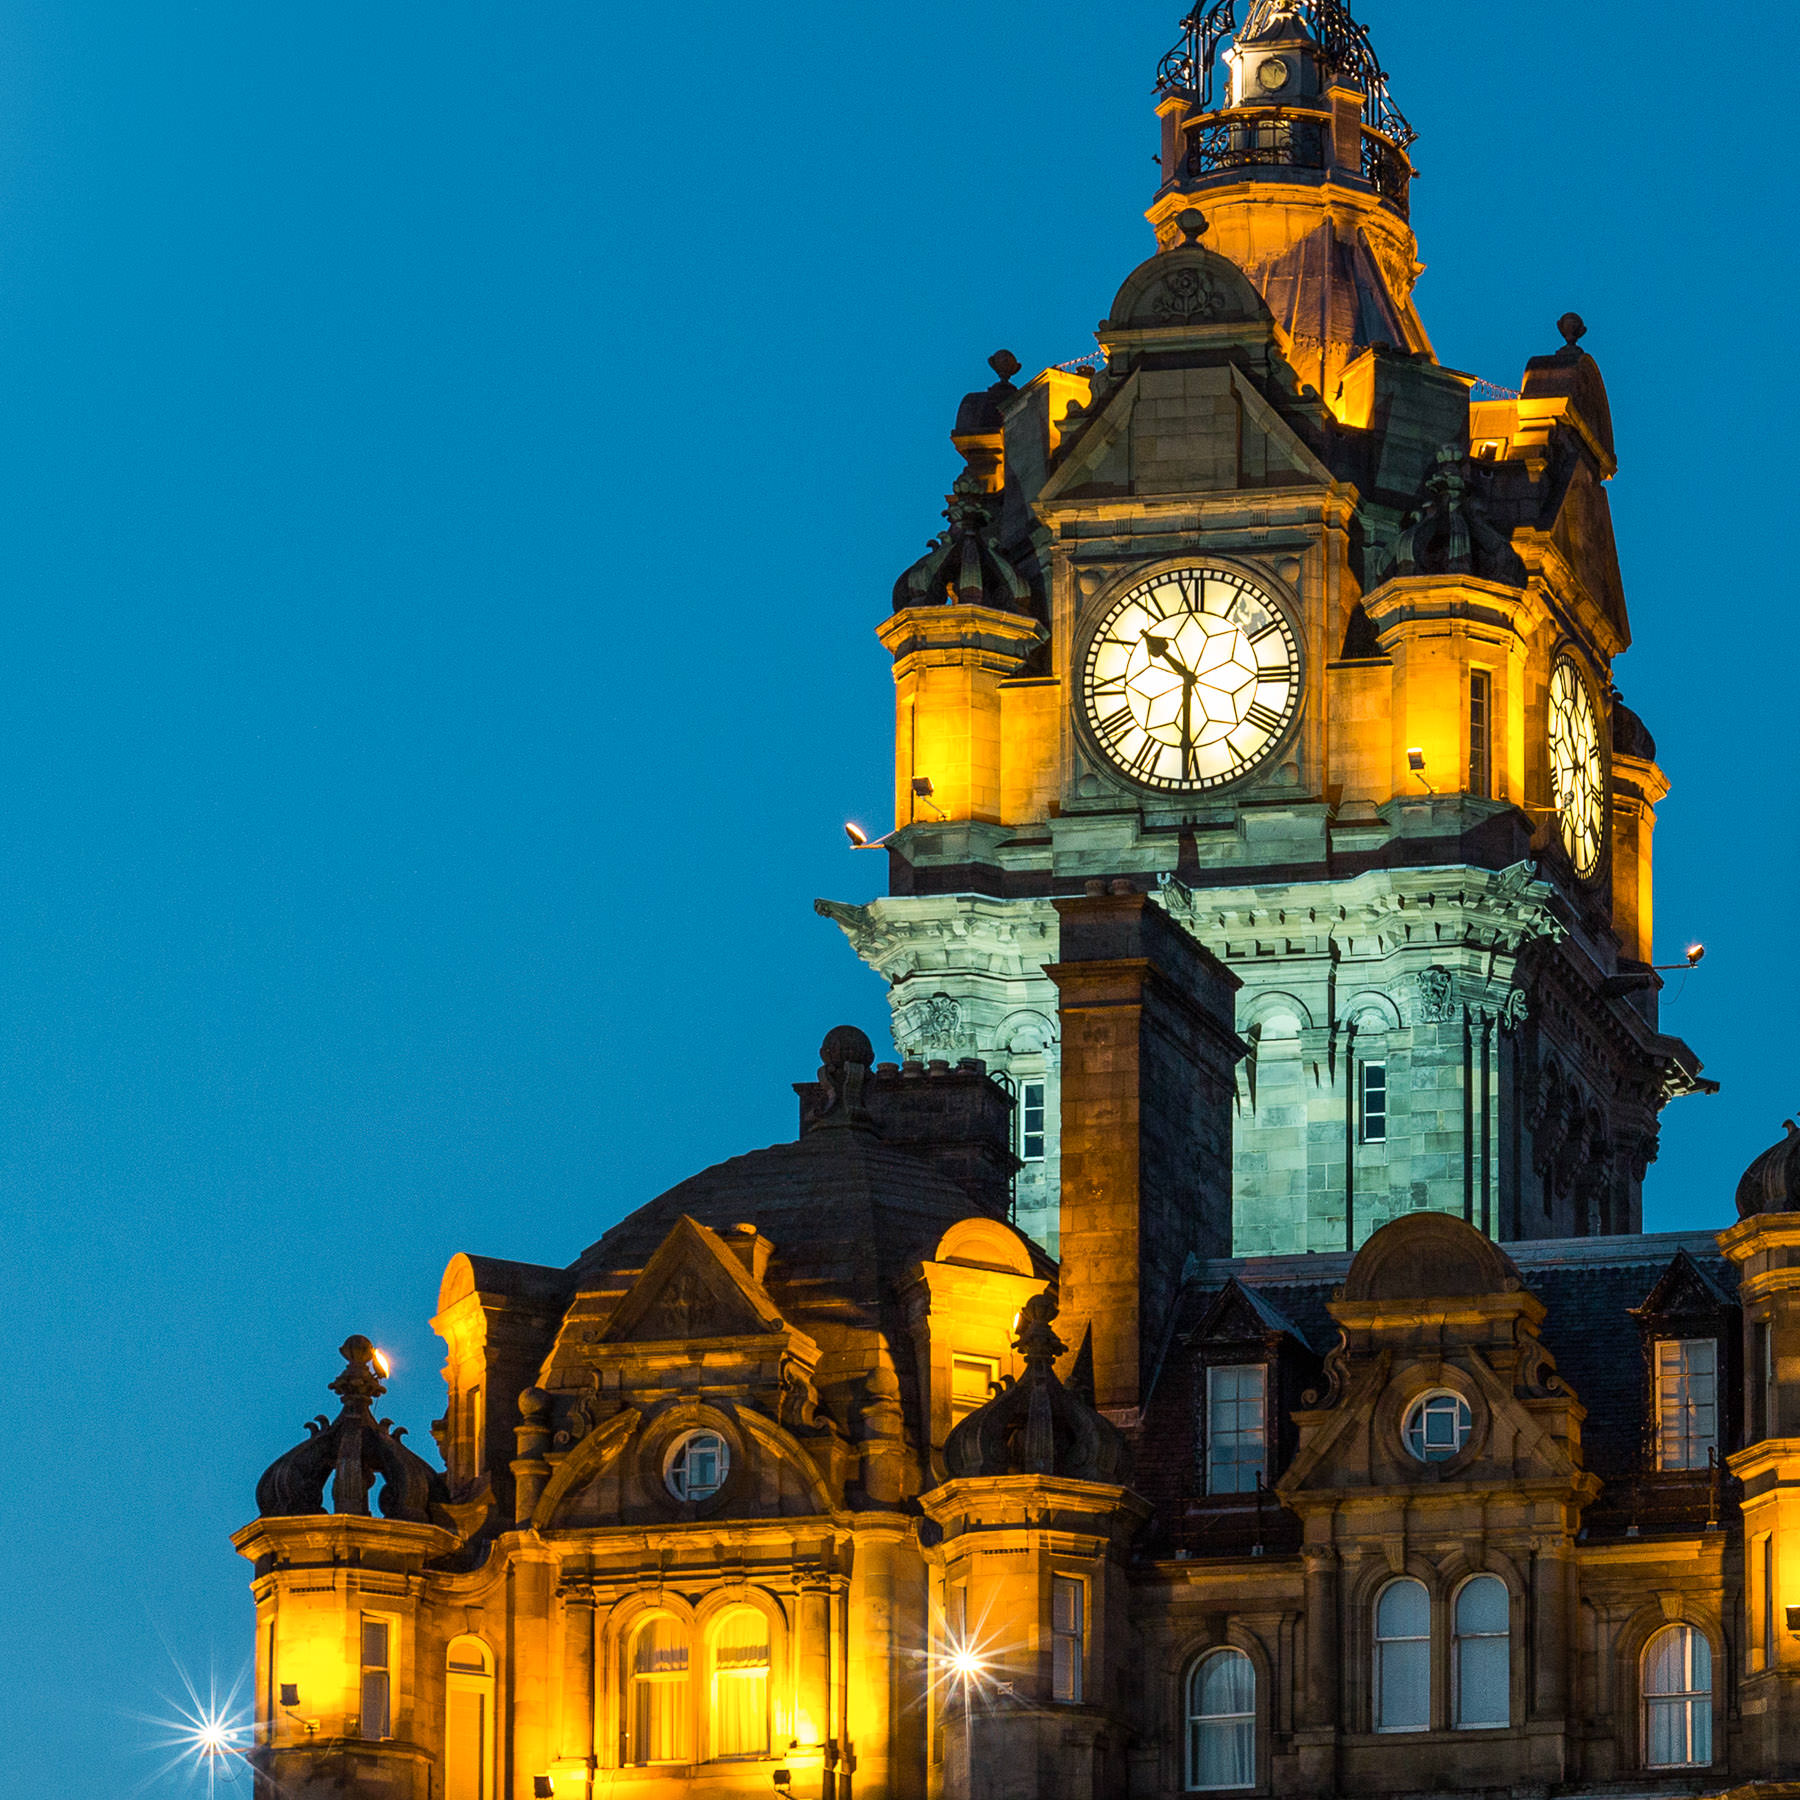 Edinburgh am Abend